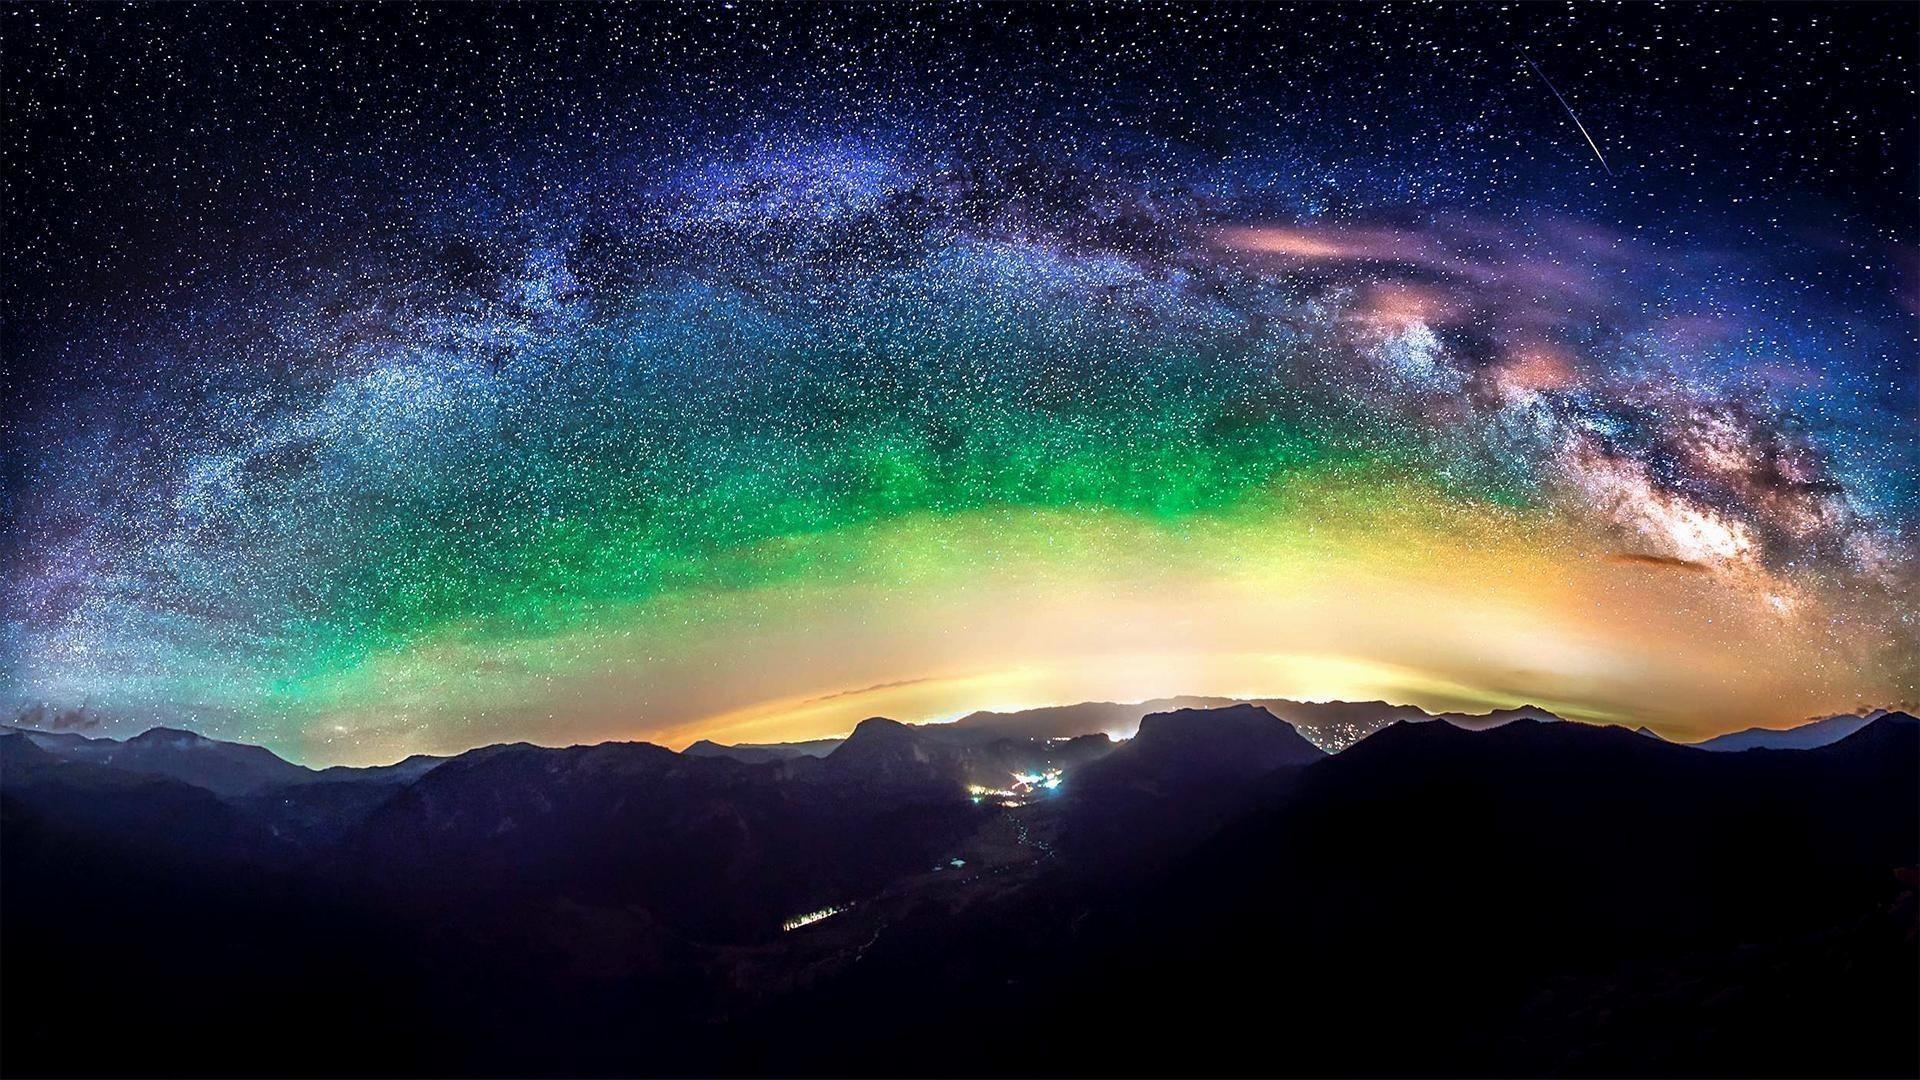 wallpaper.wiki-Milky-Way-Galaxy-Live-Wallpaper-PIC-